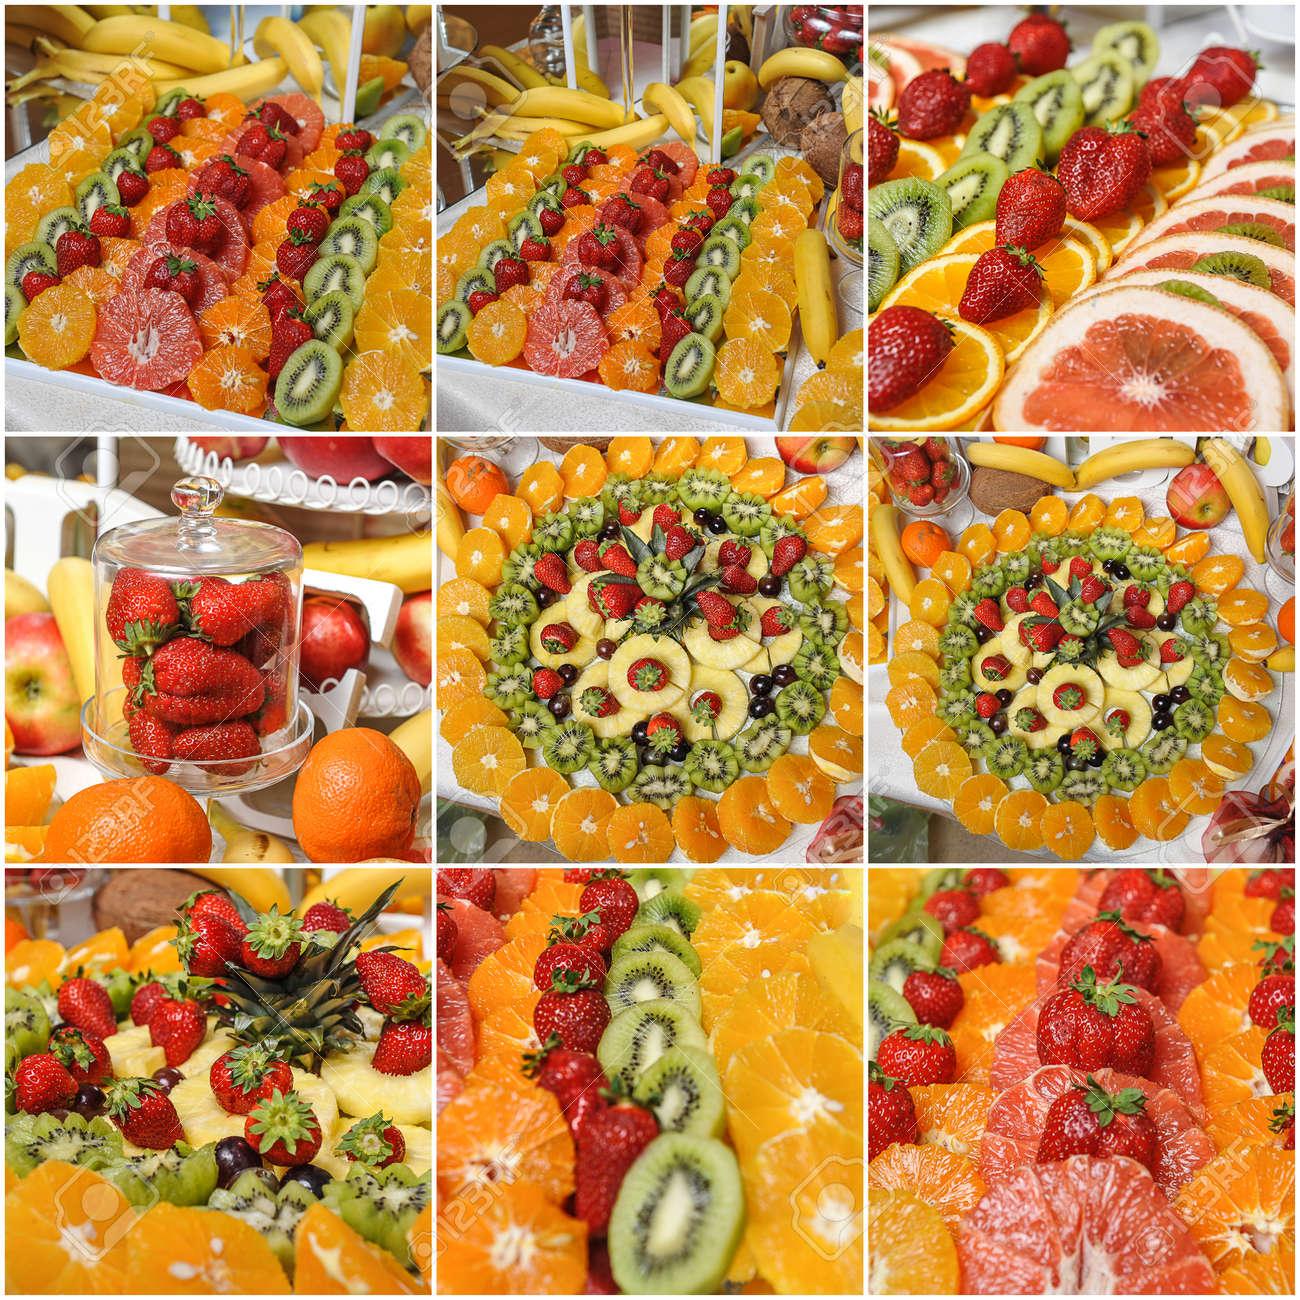 Carved Fruits Arrangement Fresh Various Fruits Assortment Of